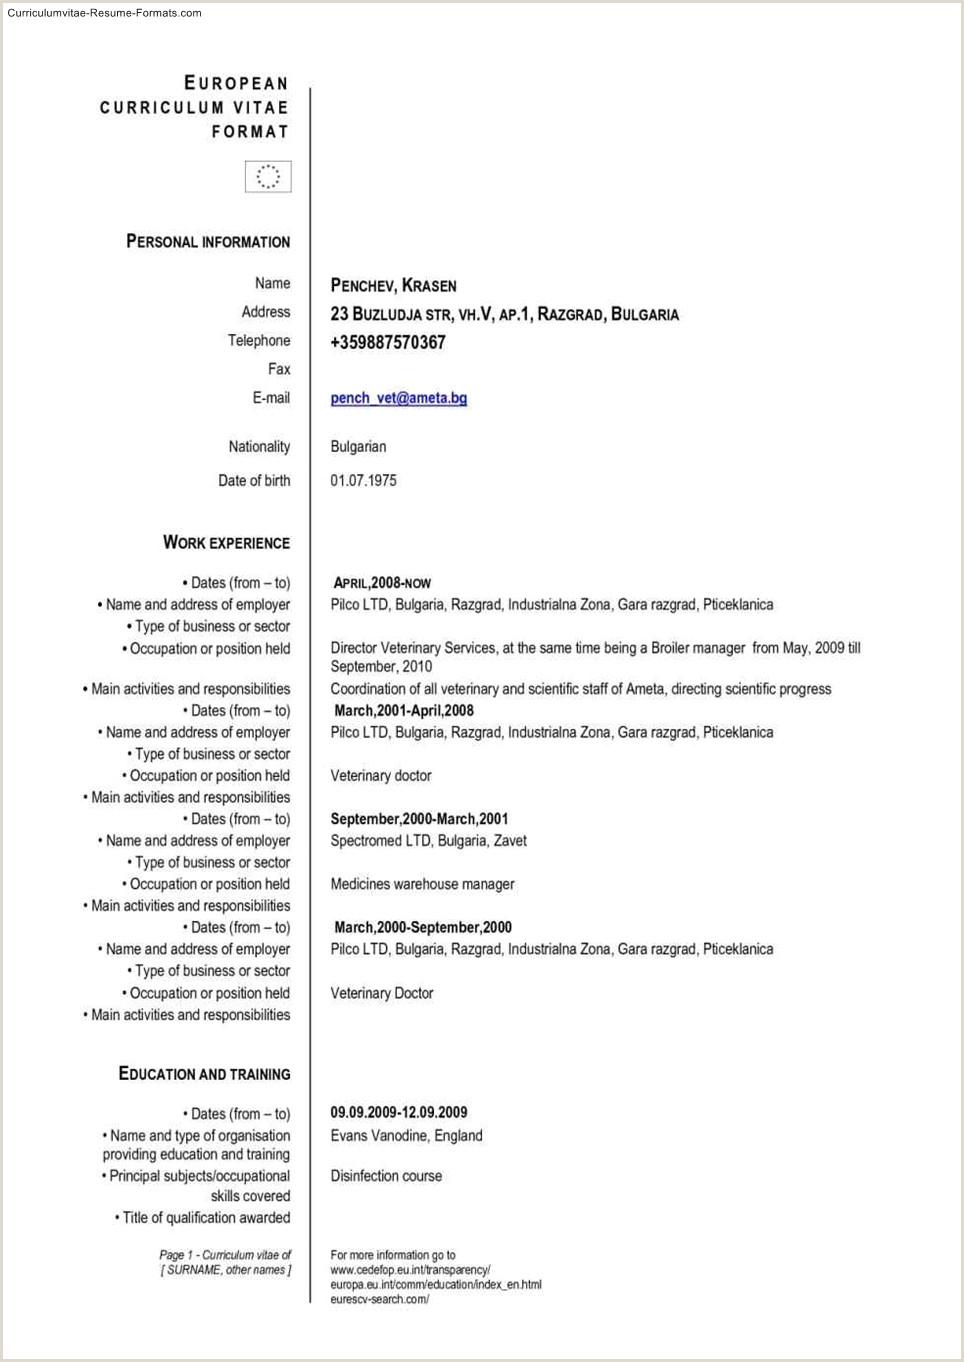 Europass Cv format Pdf 25 European Cv format